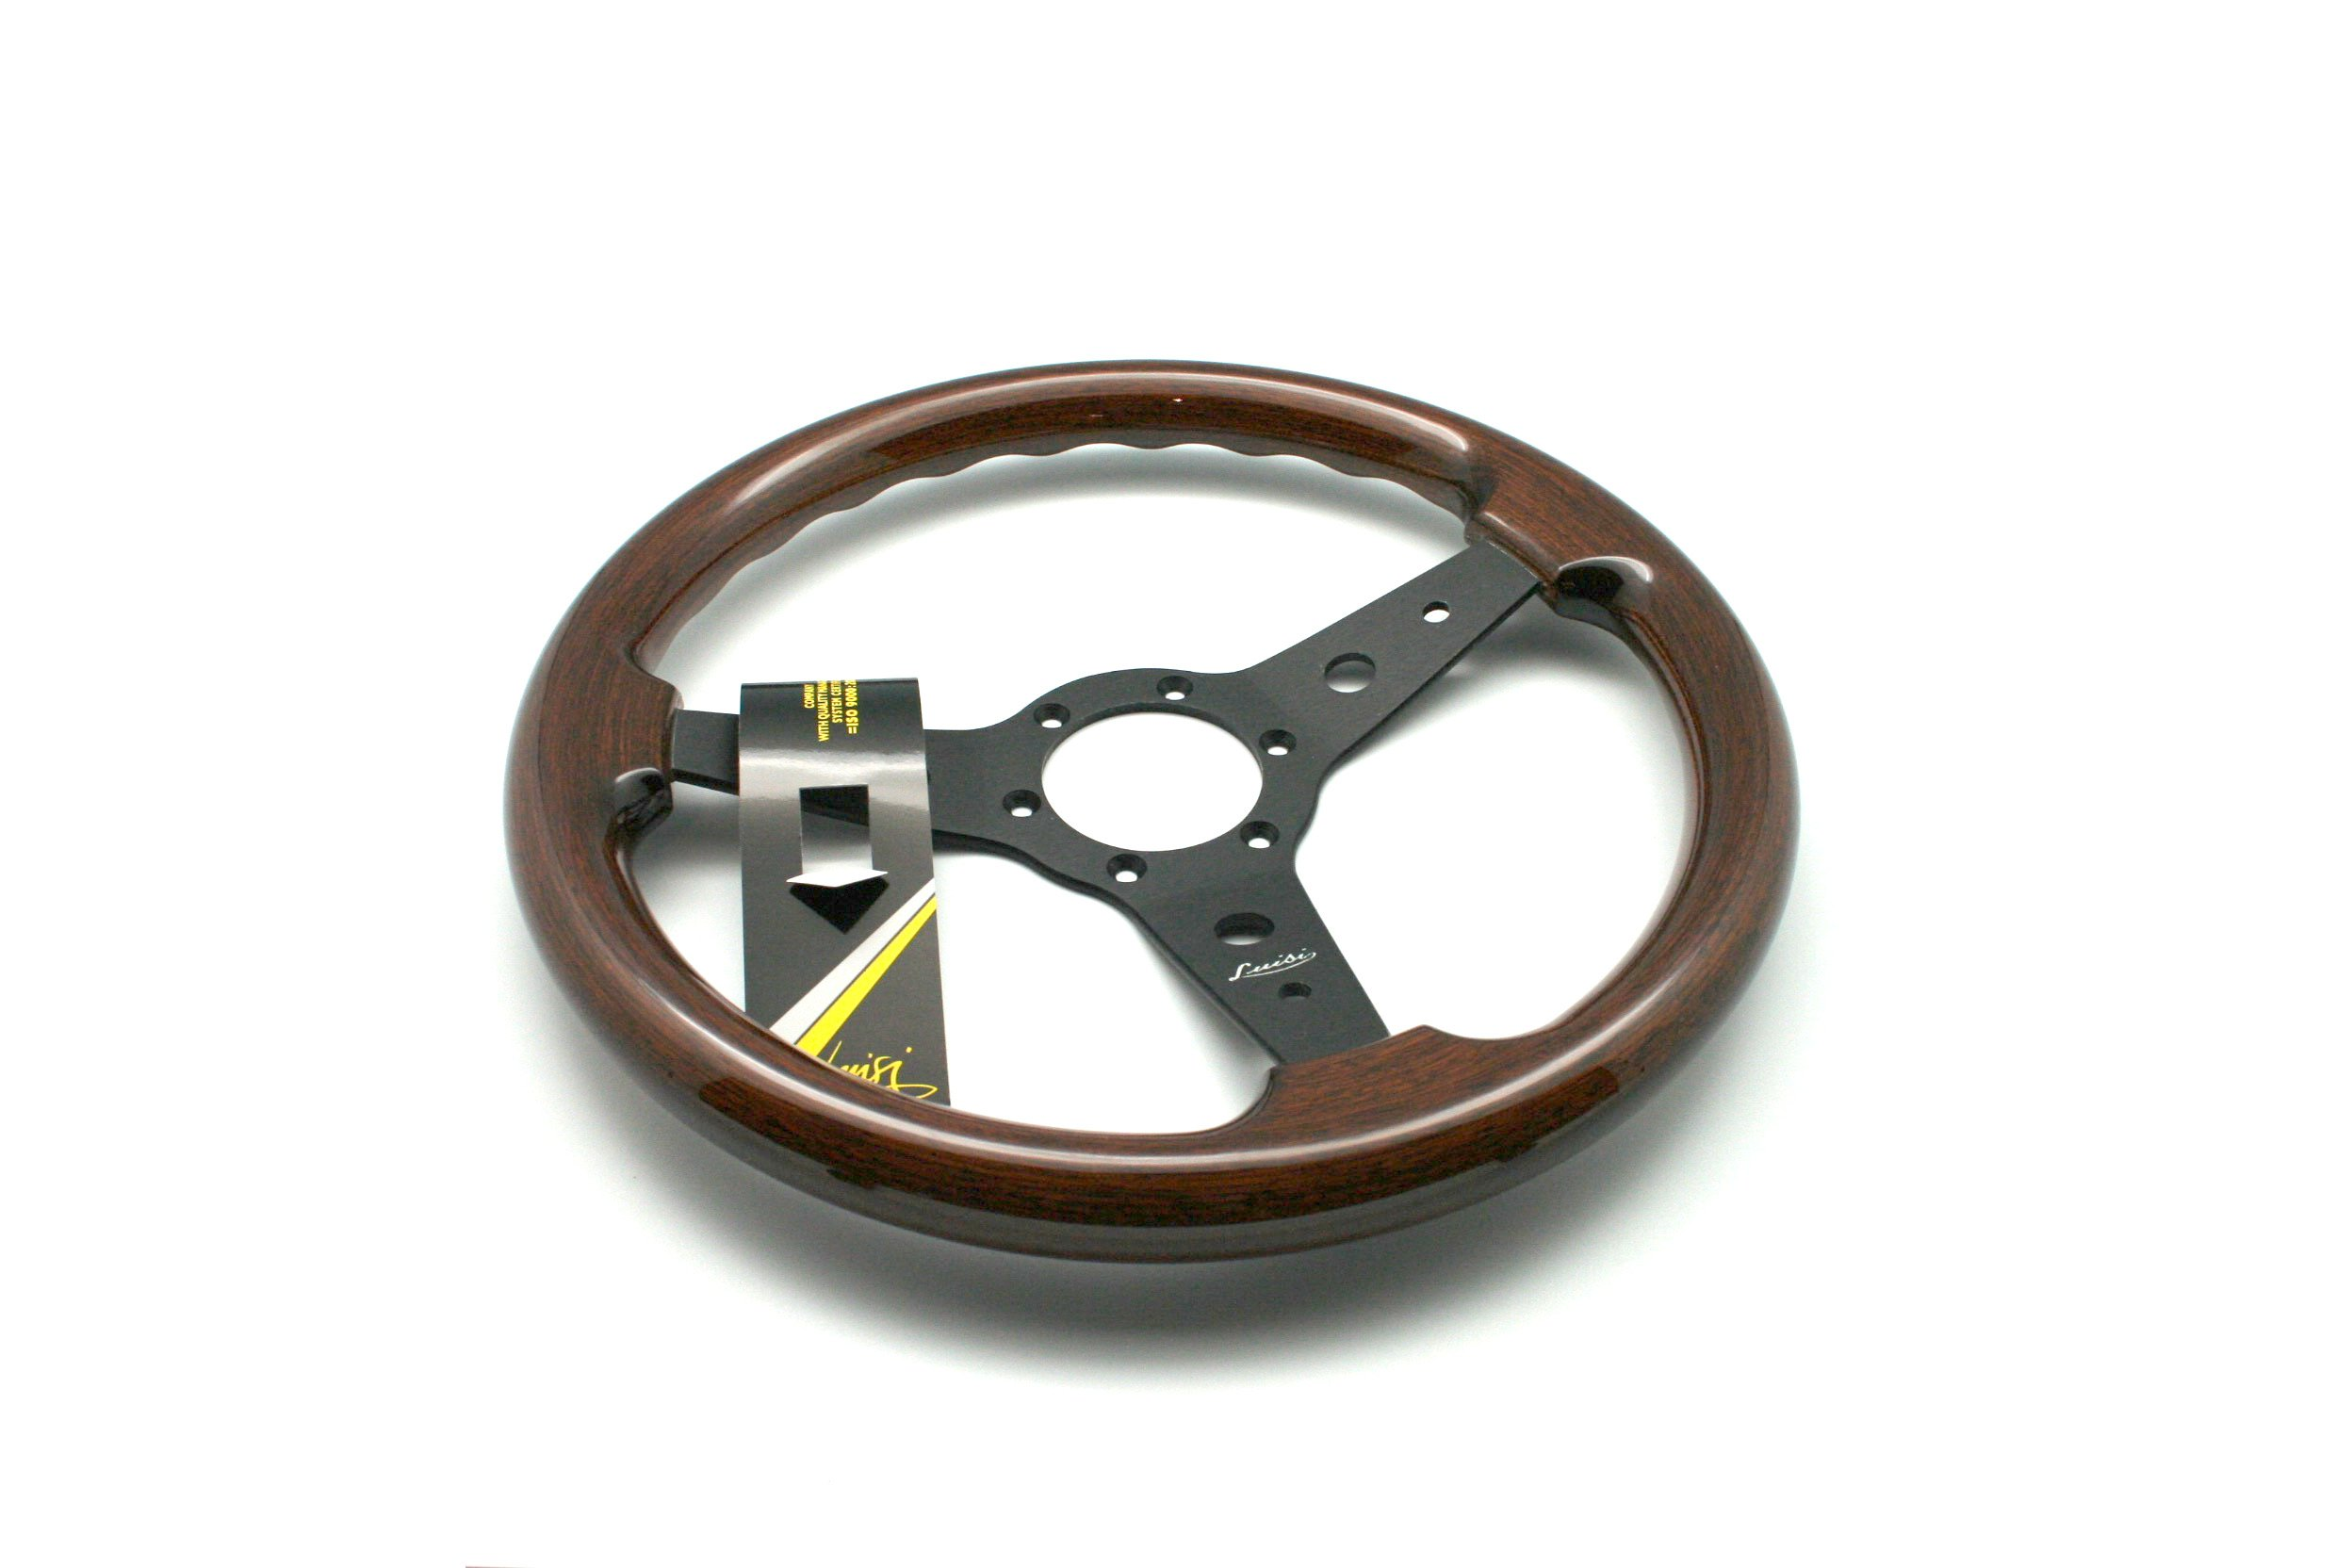 Woodys WP-SWPB9801.2 Rosewood Chrome Truck Steering Wheel Beautiful African Hardwood